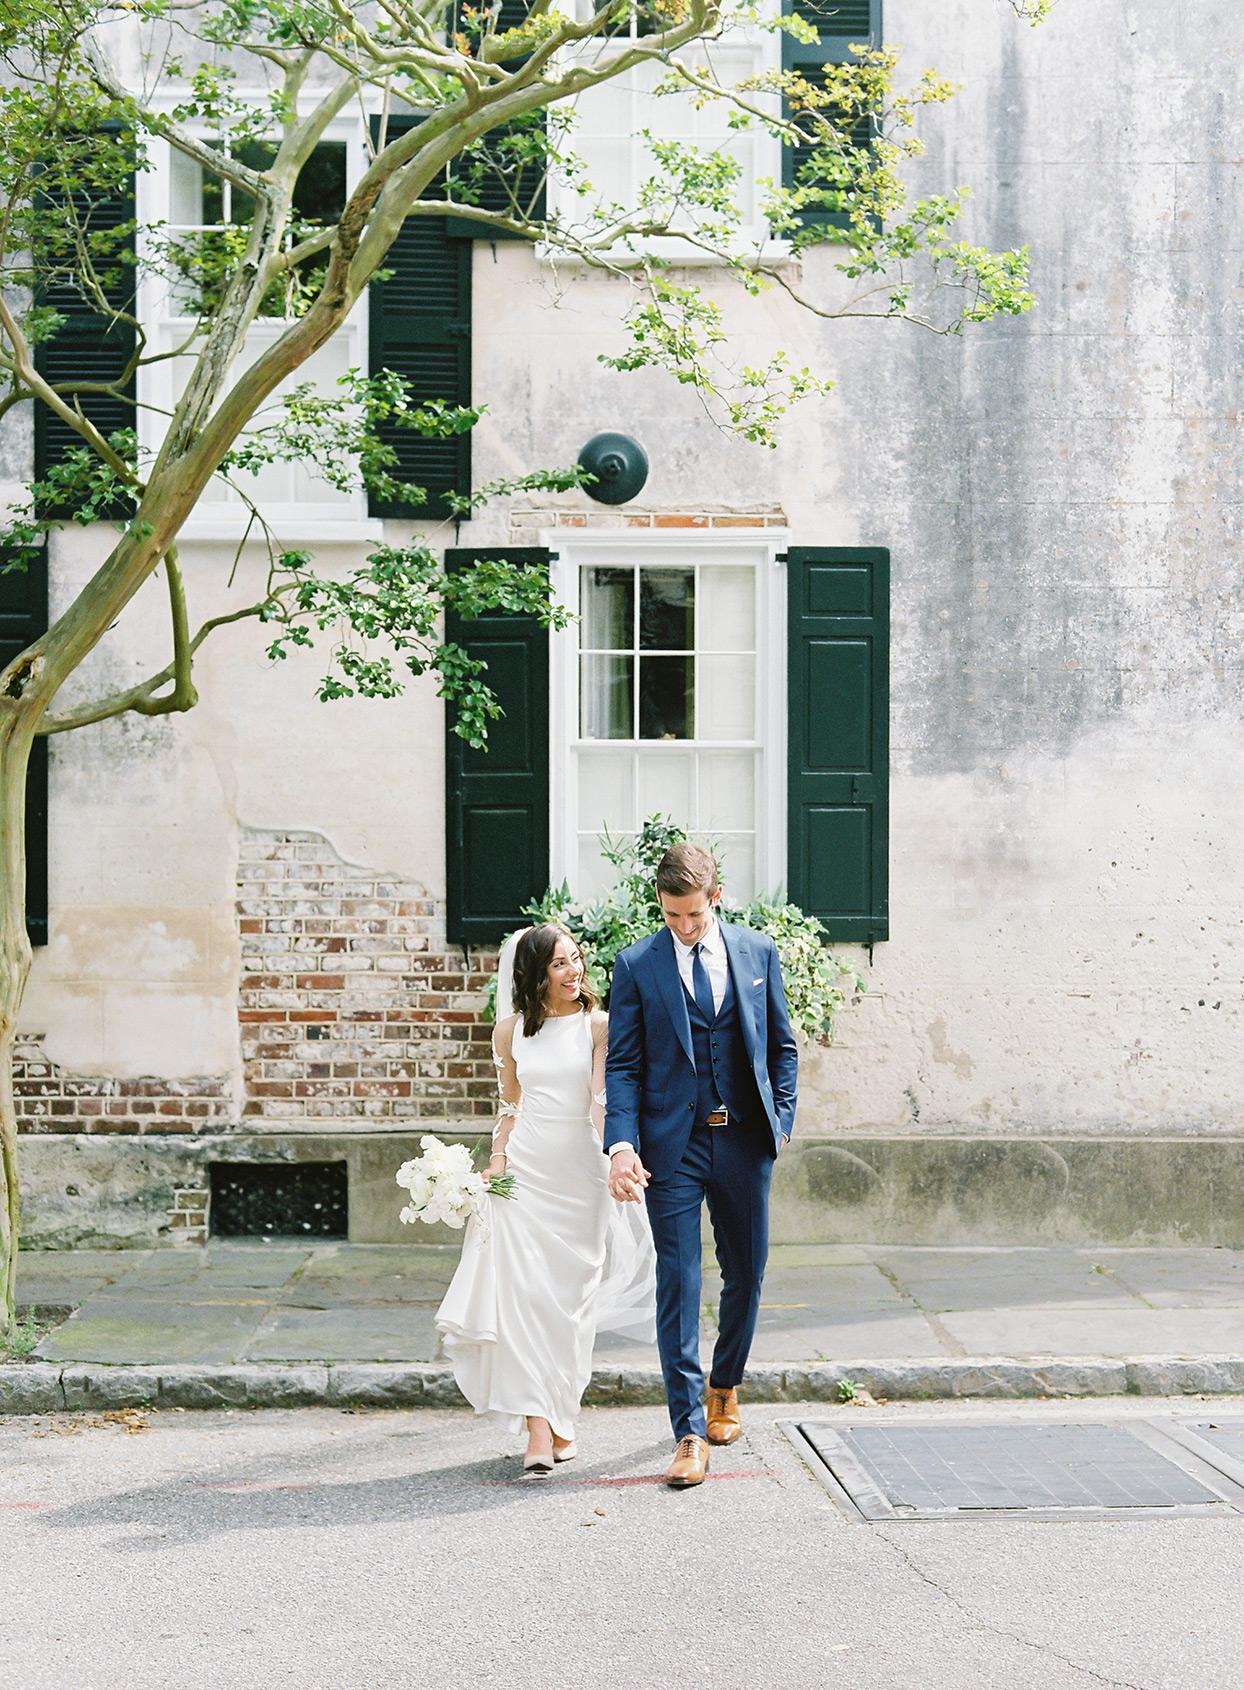 paula terence wedding couple crossing the street